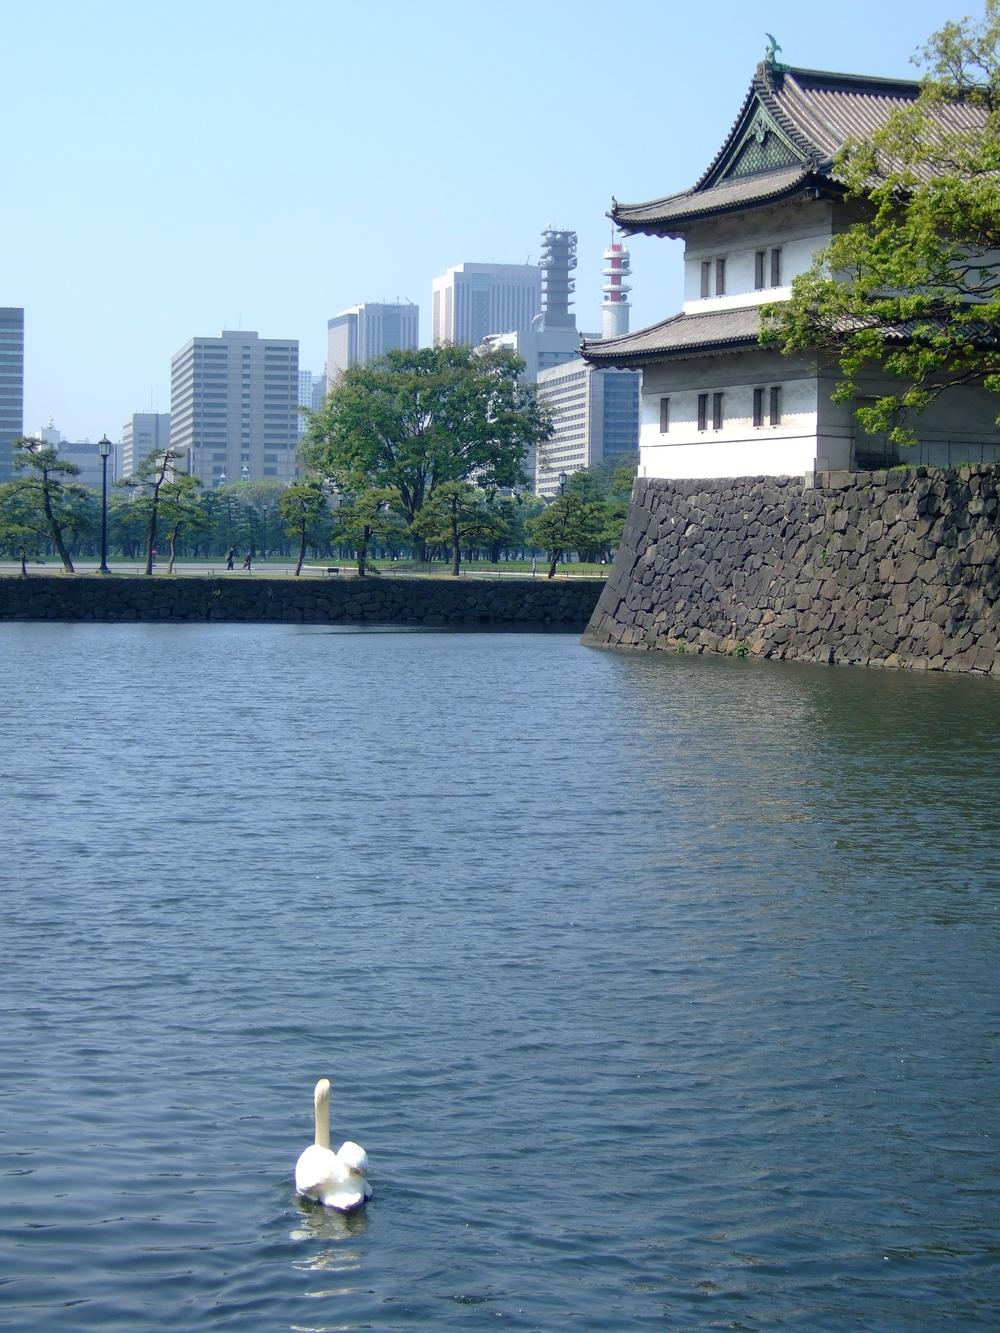 The gardens in Tokyo